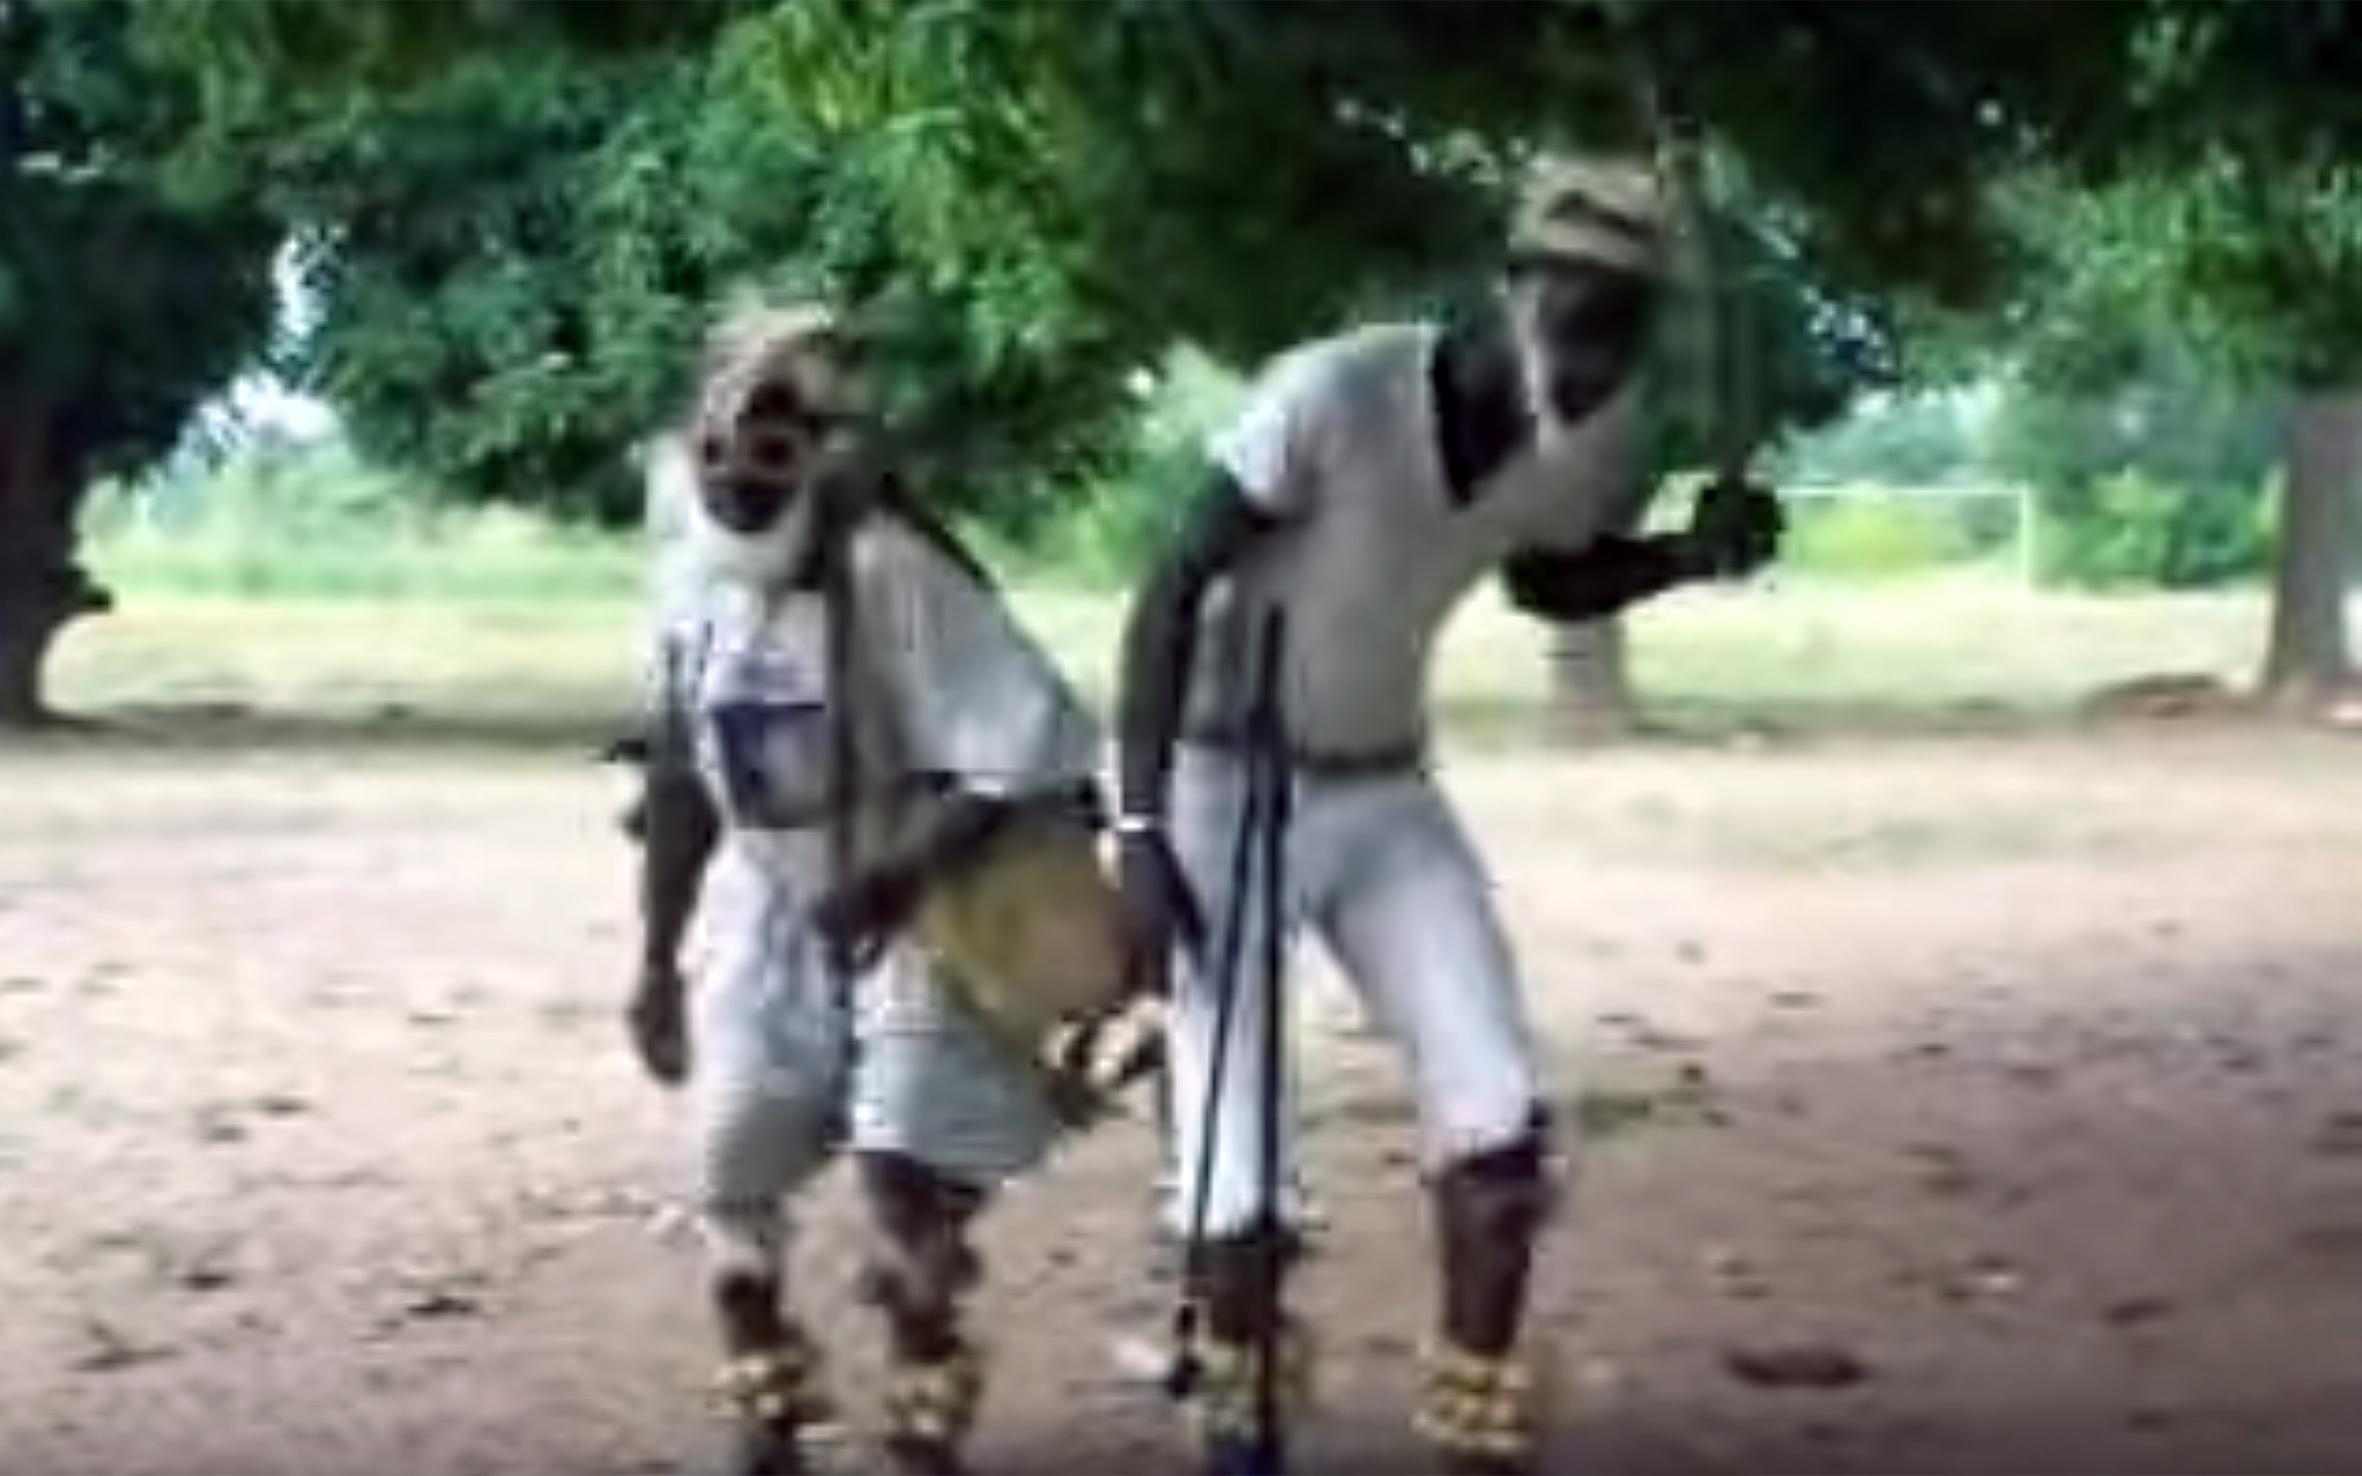 241.DITAMMARI / Benin - DITAMMARI Is a traditional dance from Ditammari people from Benin.